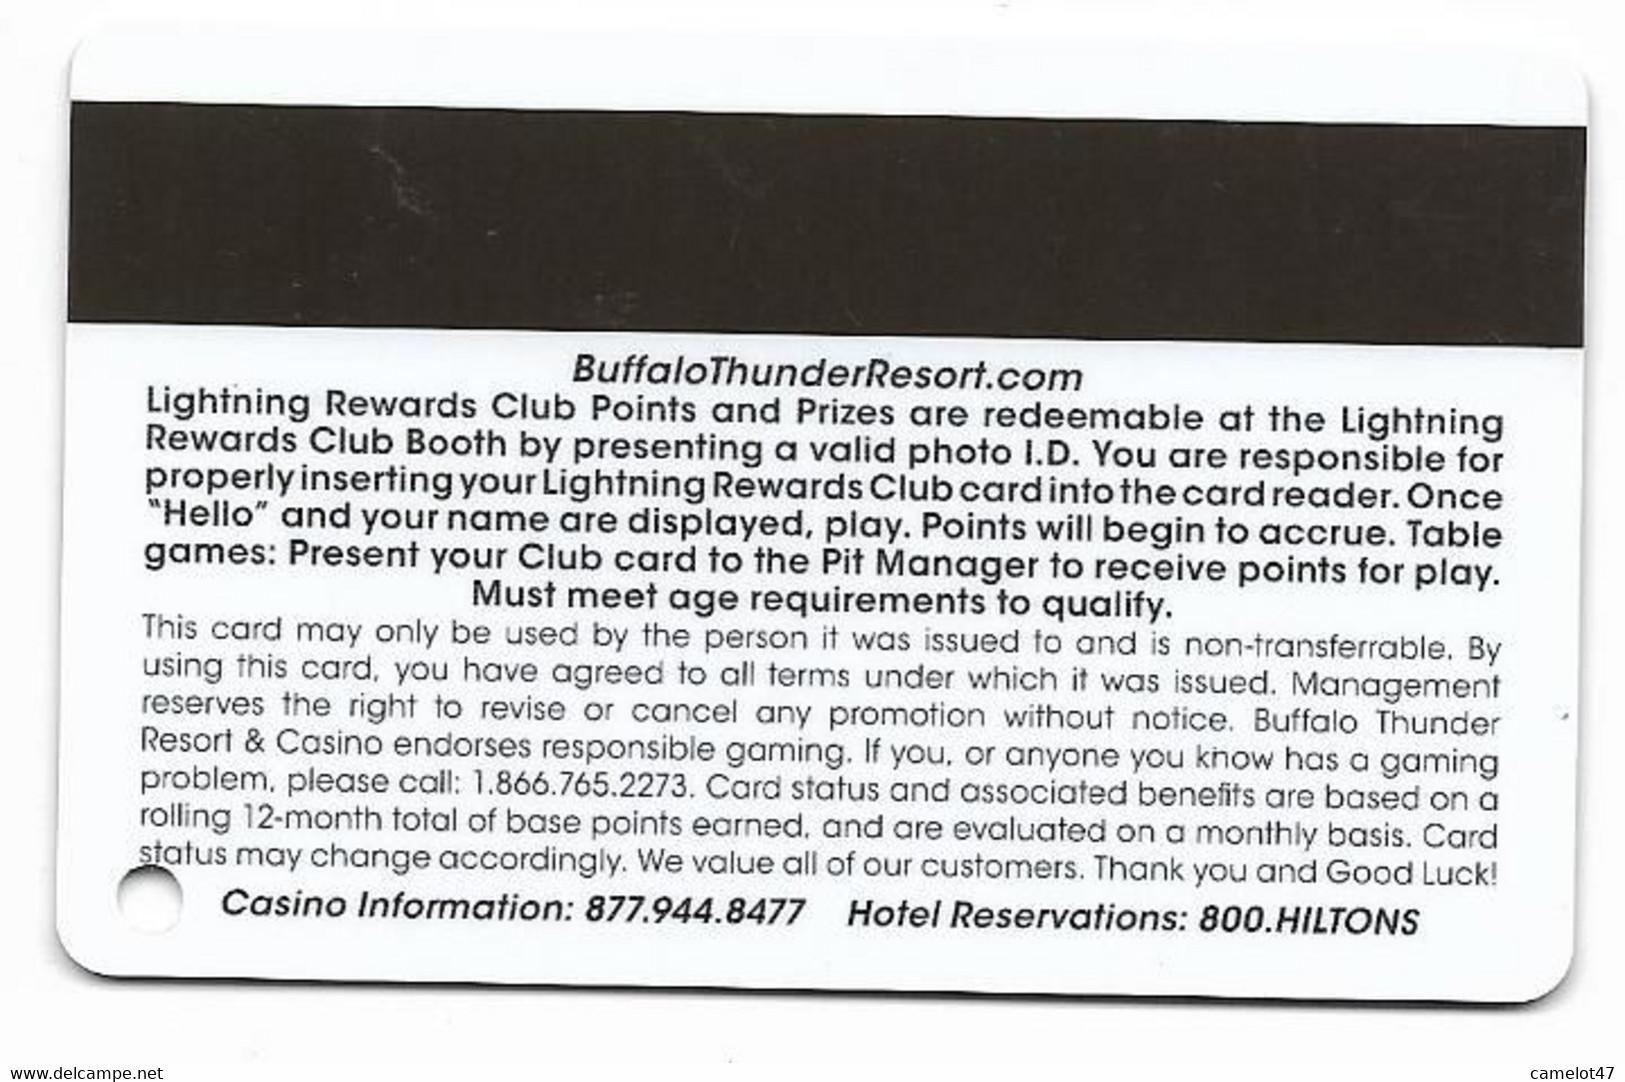 Buffalo Thunder Resort & Casino, Santa Fe, NM,  U.S.A., Older Used BLANK  Slot Or Player's Card, # Buffalothunder-4blank - Casino Cards